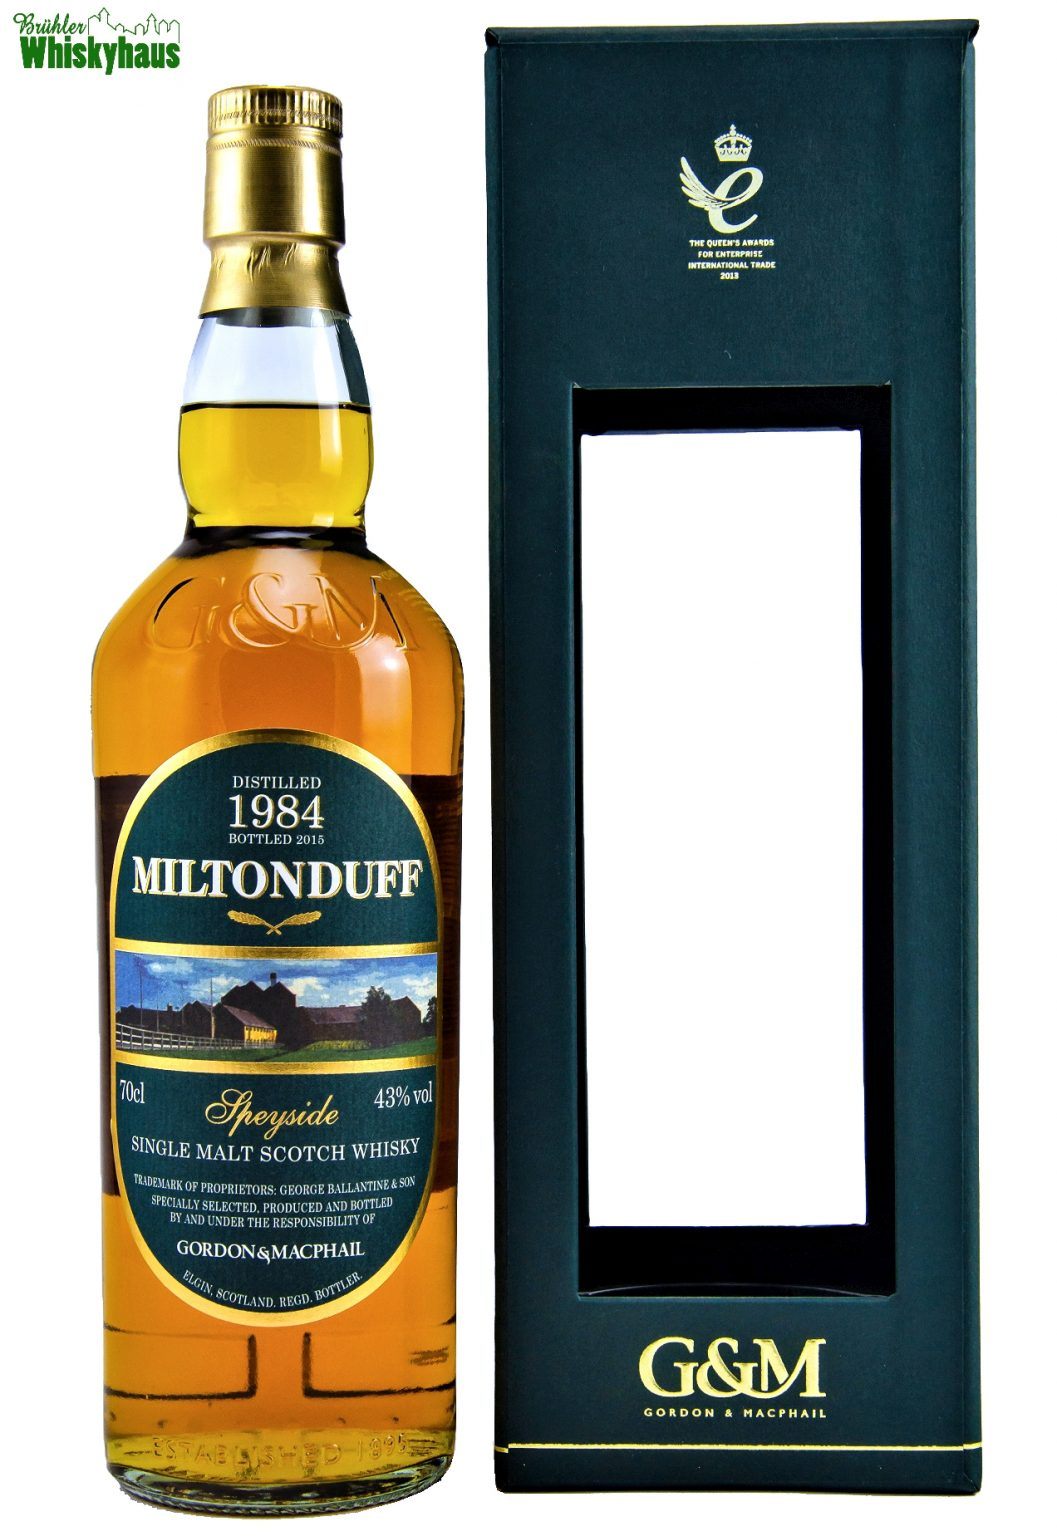 Miltonduff Vintage 1984 - 2015 - Refill Ex-Bourbon Barrels - Gordon & MacPhail - Single Malt Scotch Whisky